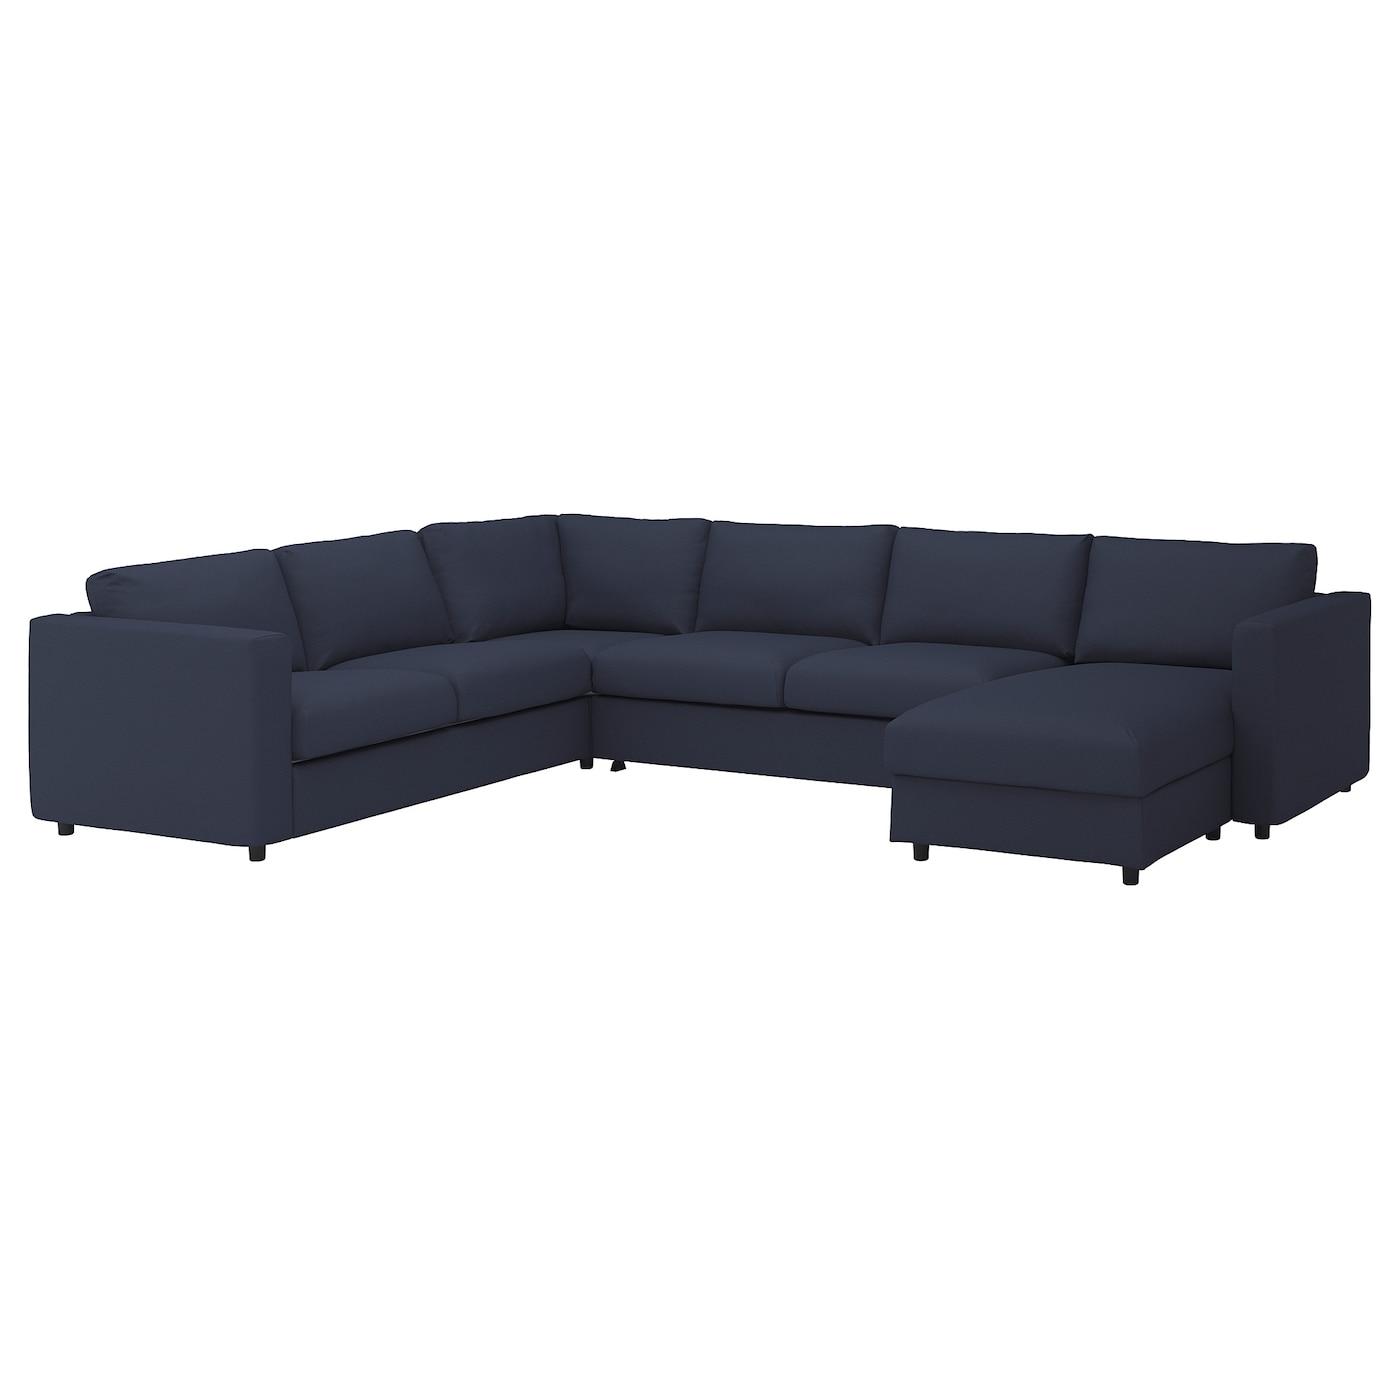 Vimle Corner Sleeper Sofa 5 Seat With